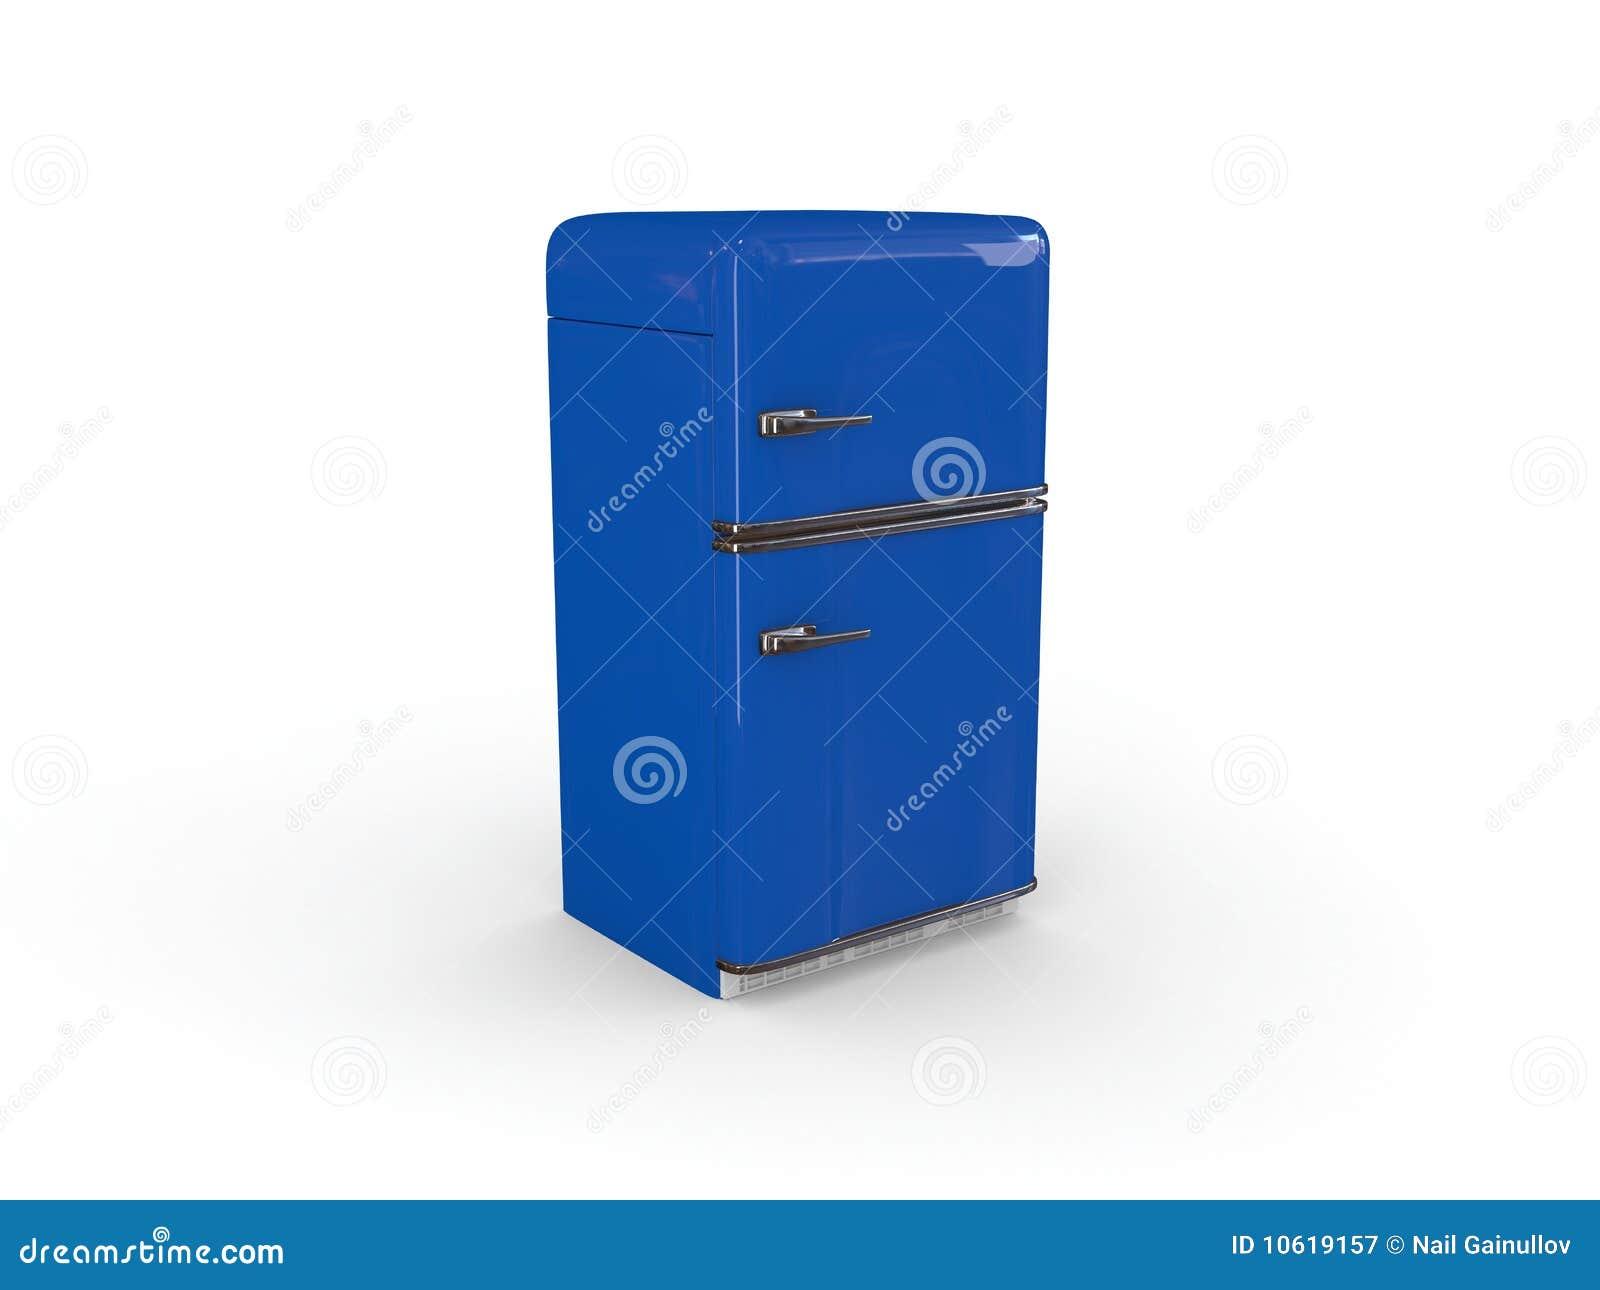 Blue Retro Refrigerator Royalty Free Stock Photography